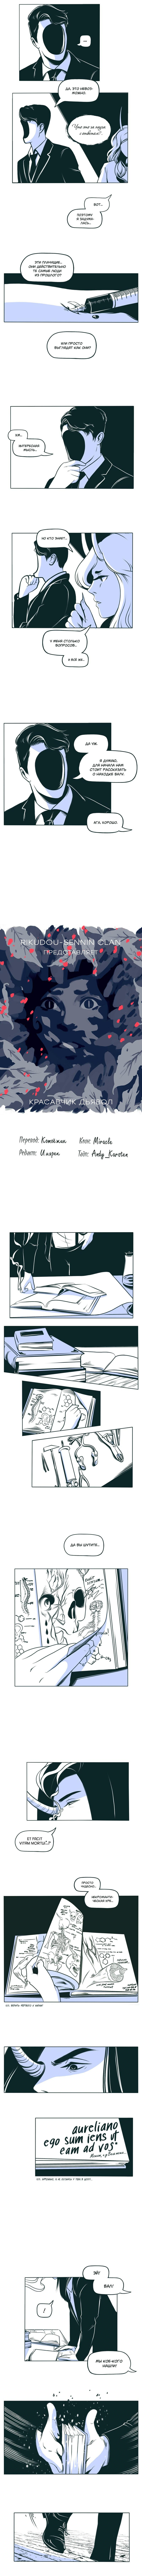 https://r1.ninemanga.com/comics/pic2/0/33536/420921/1534437743108.jpg Page 2